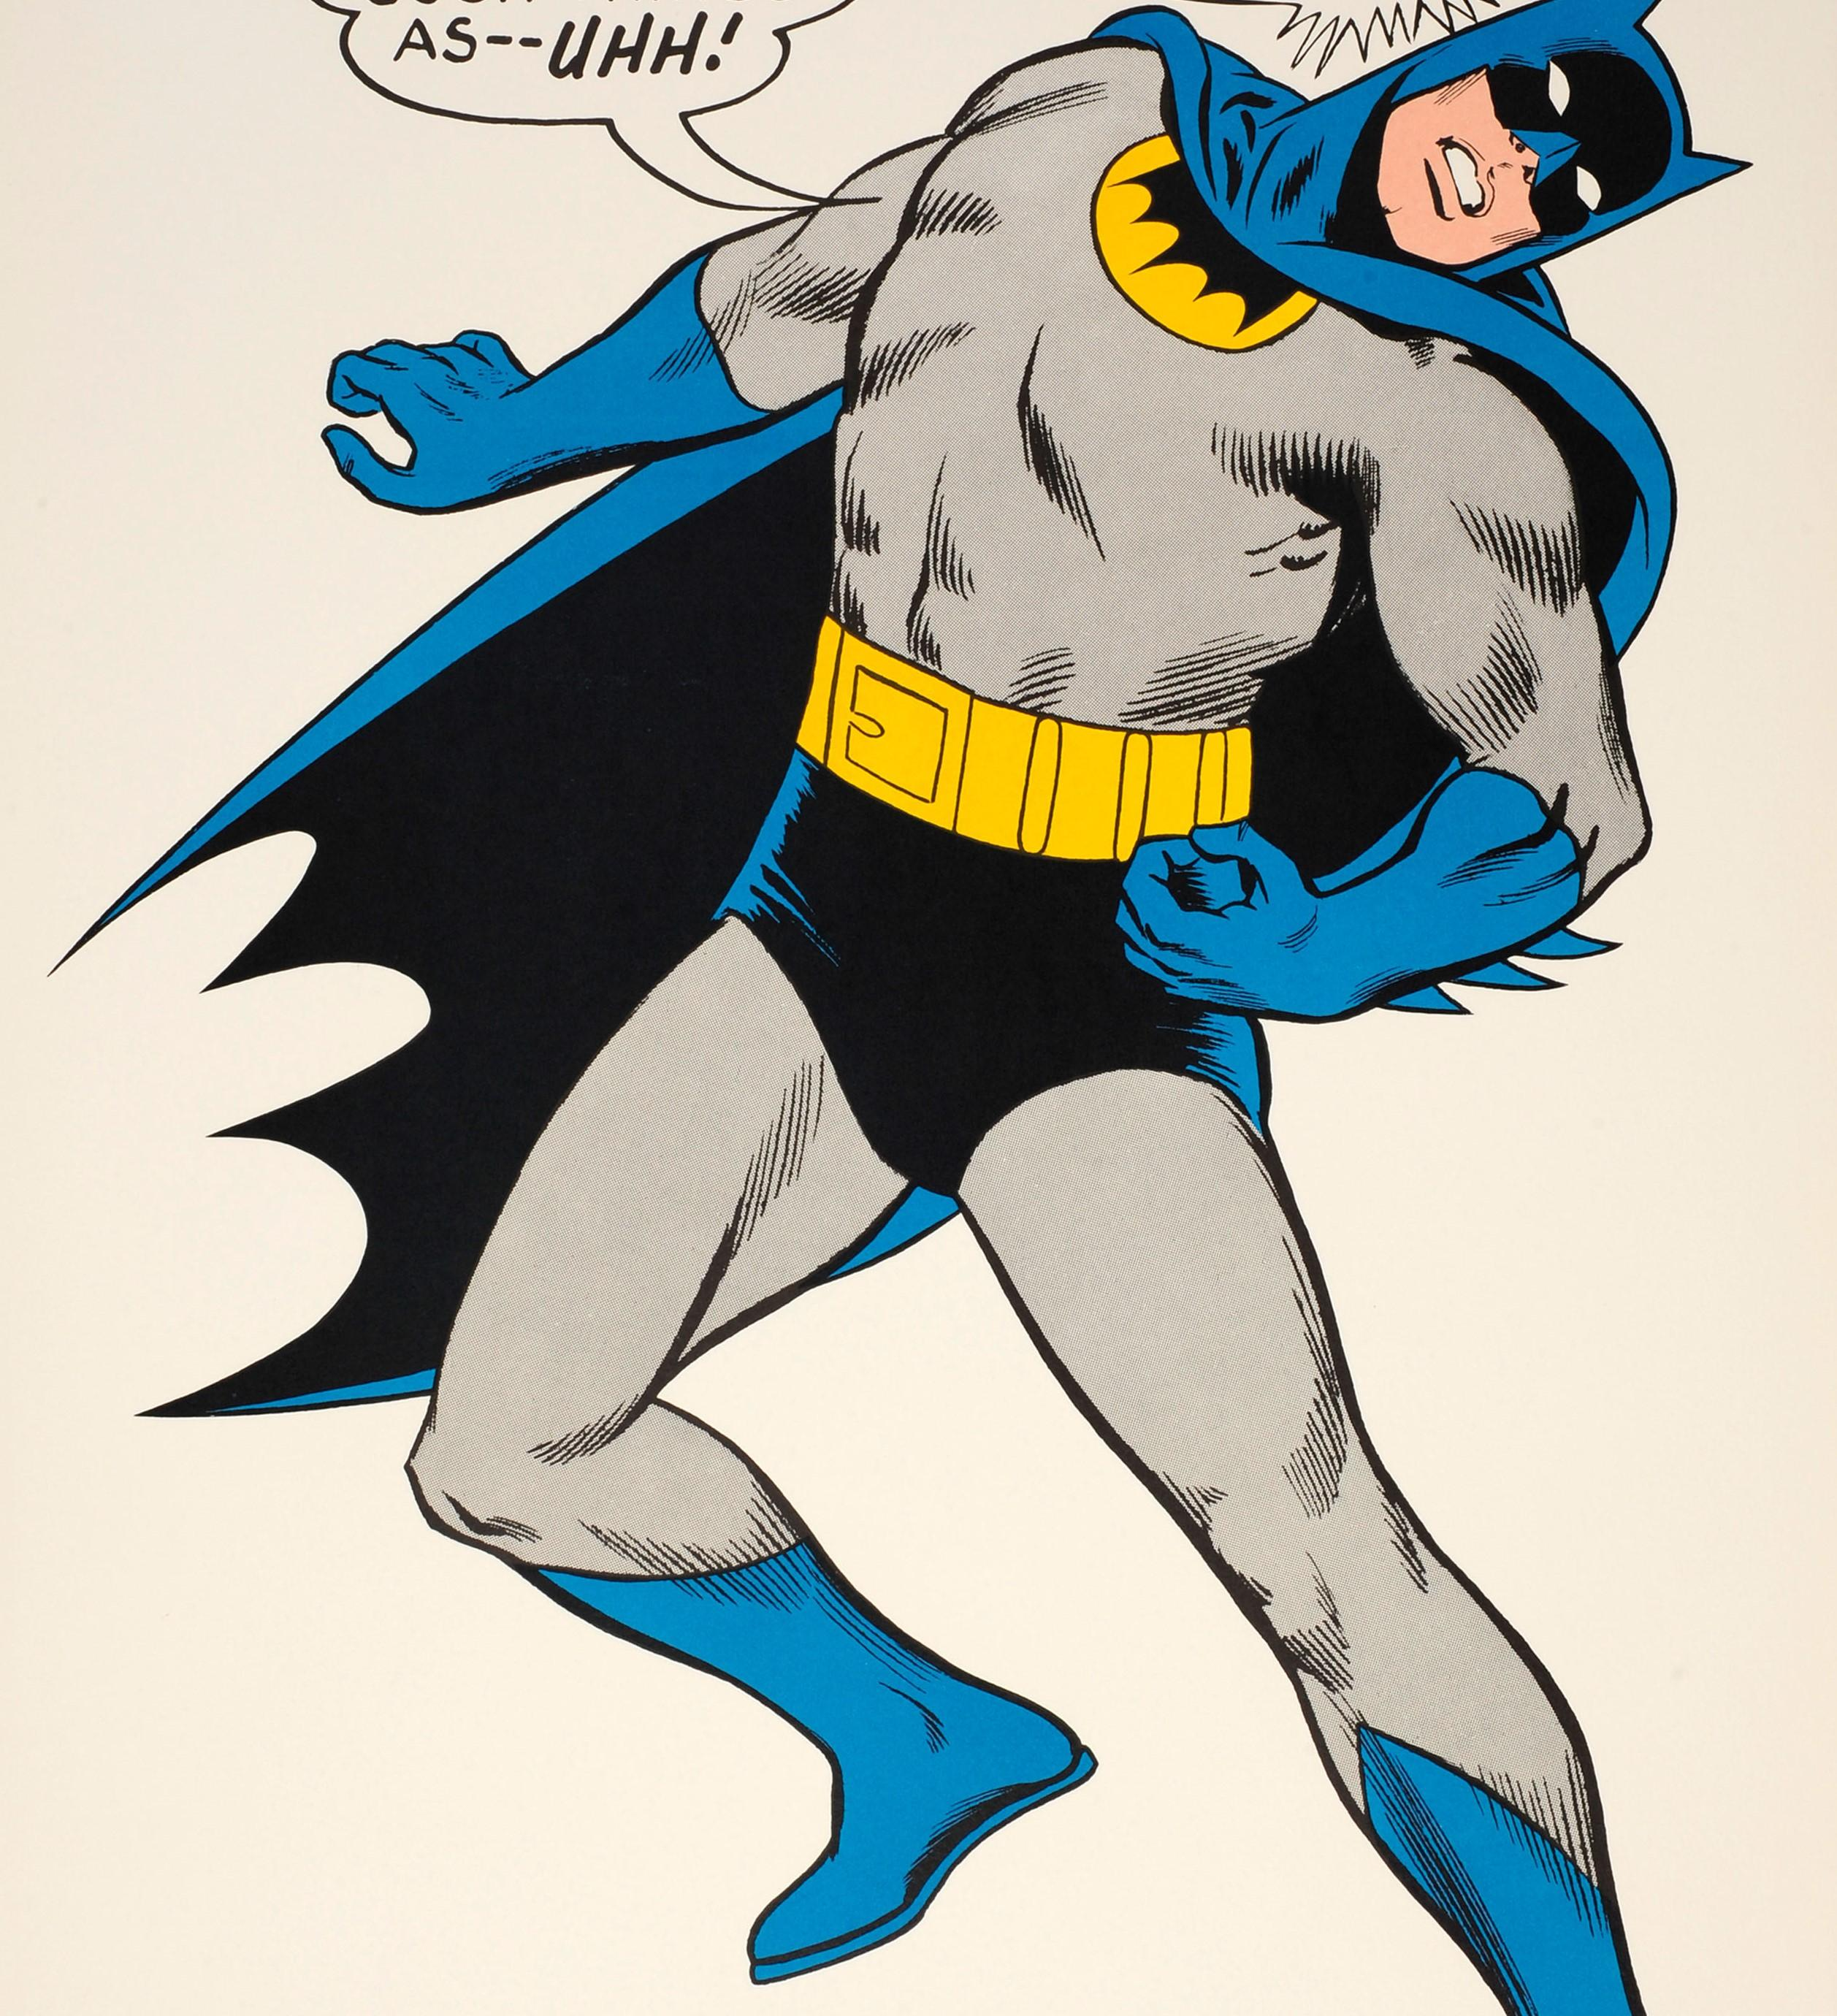 Carmine Infantino Original Vintage Cartoon Batman Poster For The Iconic Comic Superhero Uhh For Sale At 1stdibs